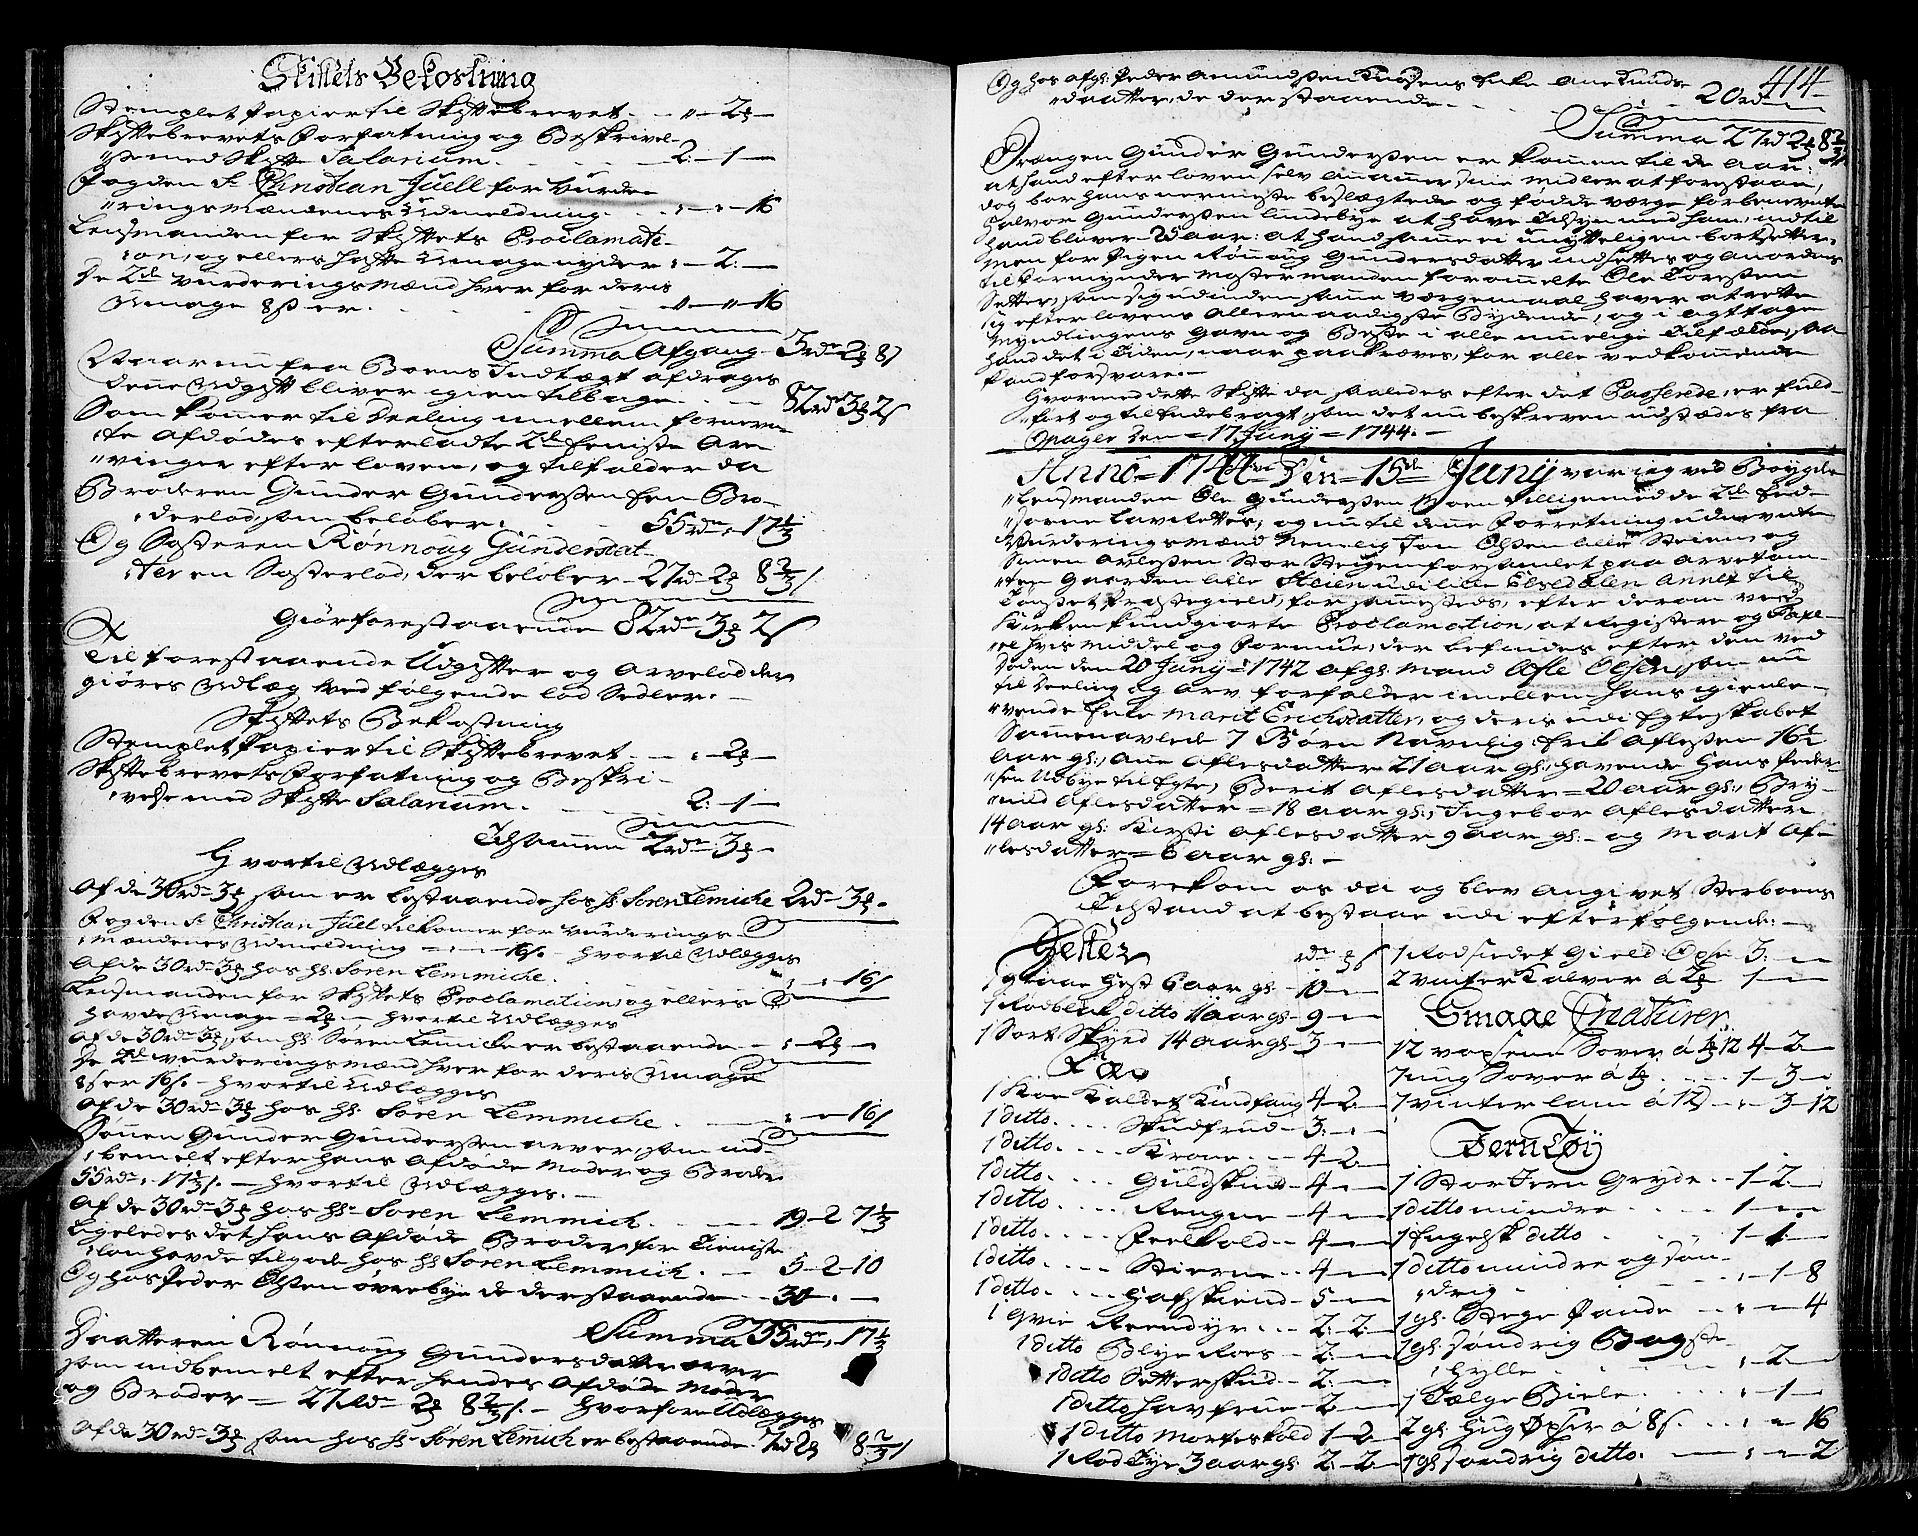 SAH, Solør og Østerdalen sorenskriveri, J/Ja/L0008A: Skifteprotokoll, 1742-1747, s. 413b-414a